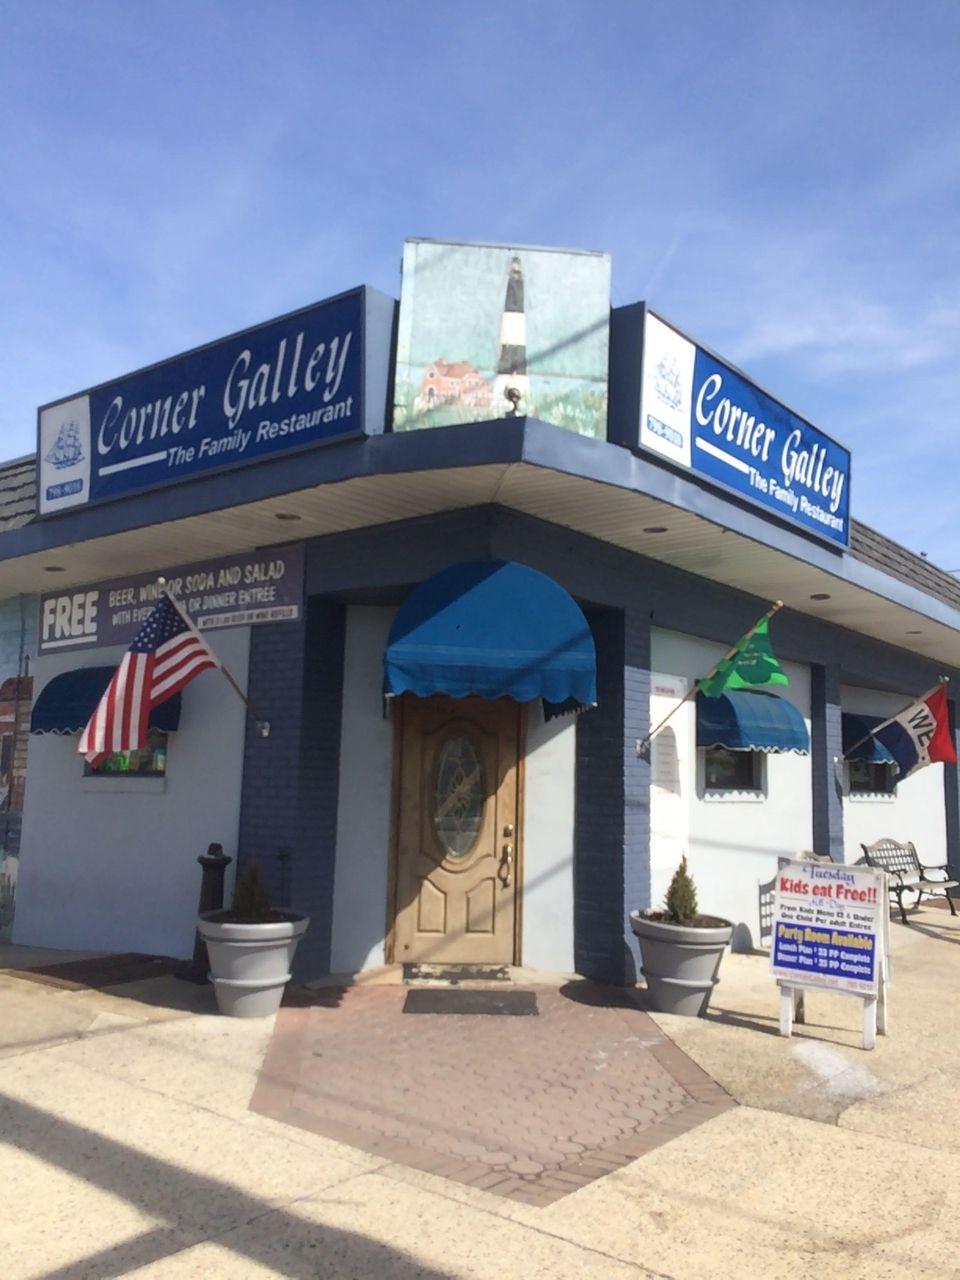 Corner Galley (5411 Merrick Rd., Massapequa)ON THE